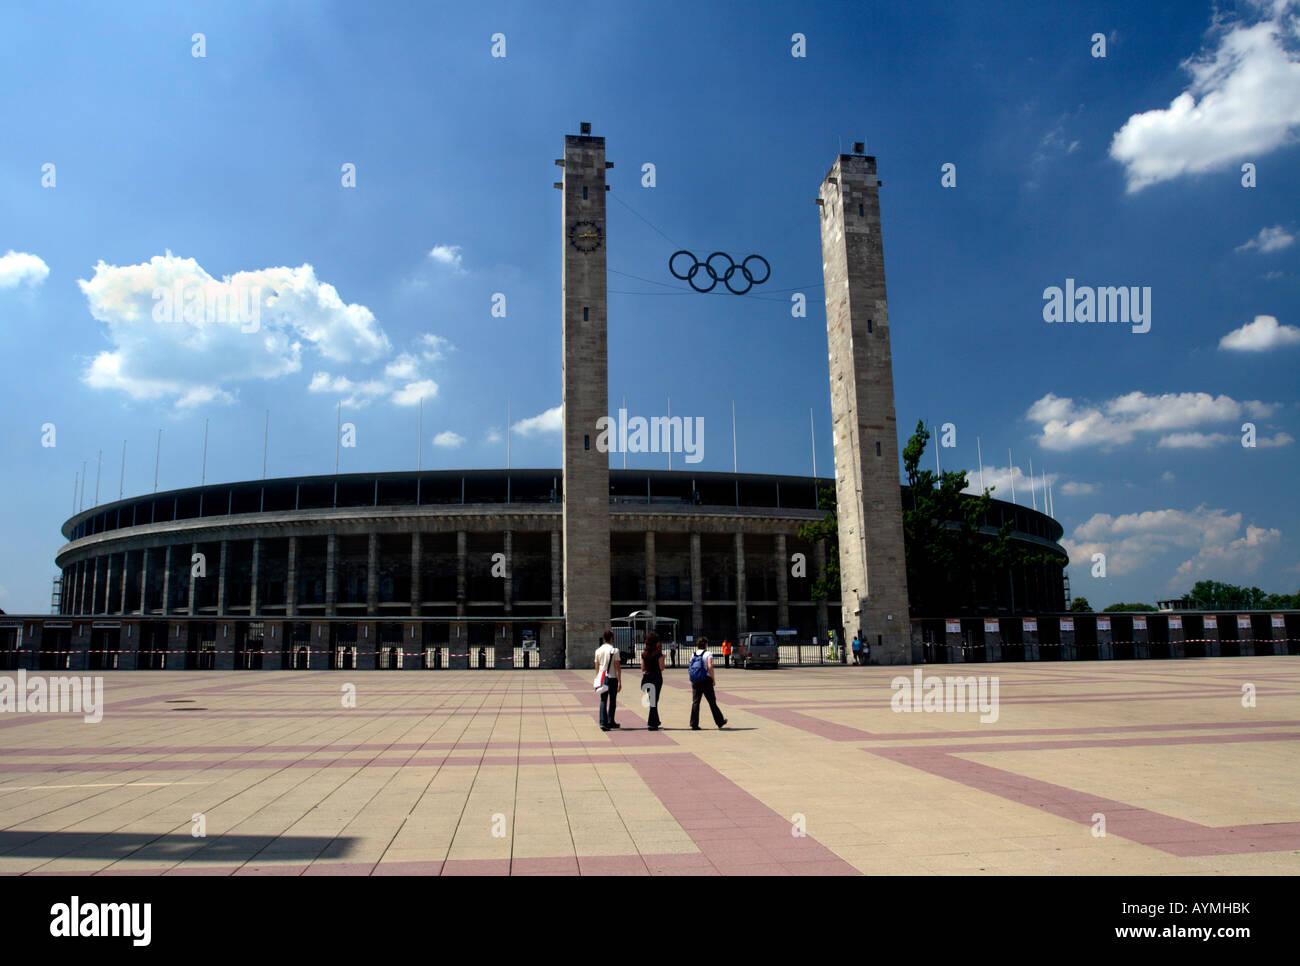 Entrance to Olympic Stadium (Olympiastadion), Berlin, Germany - Stock Image